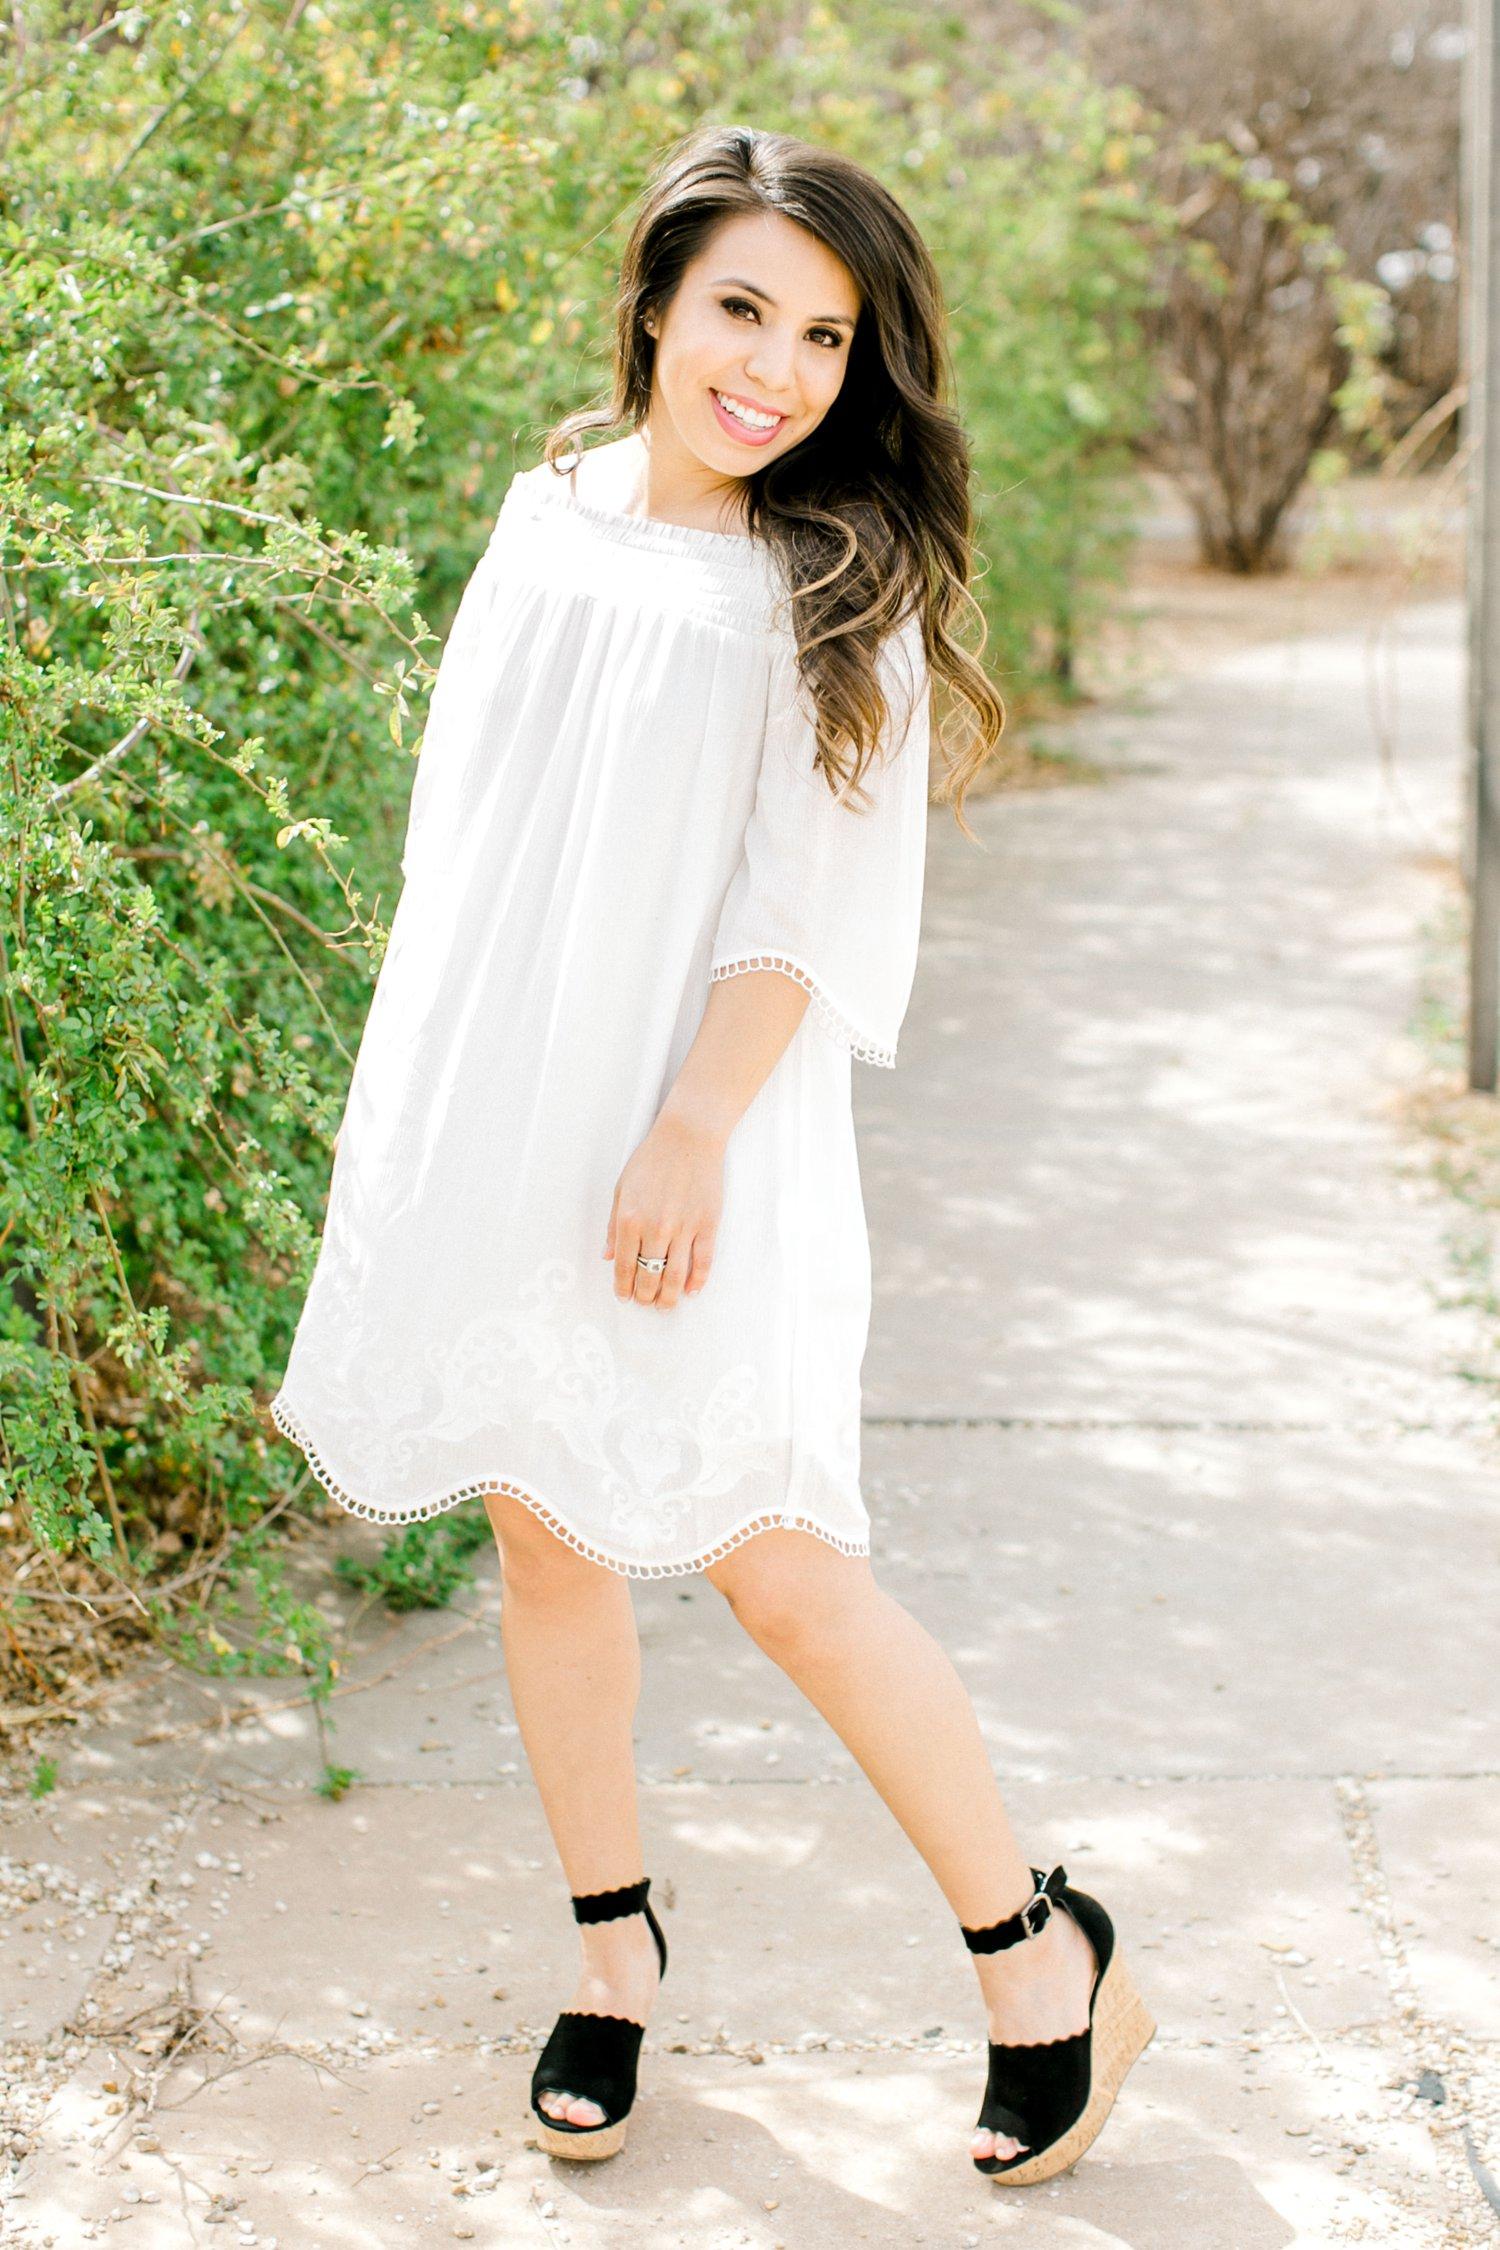 Desirae-morales-texas-tech-university-senior-photography_0003.jpg